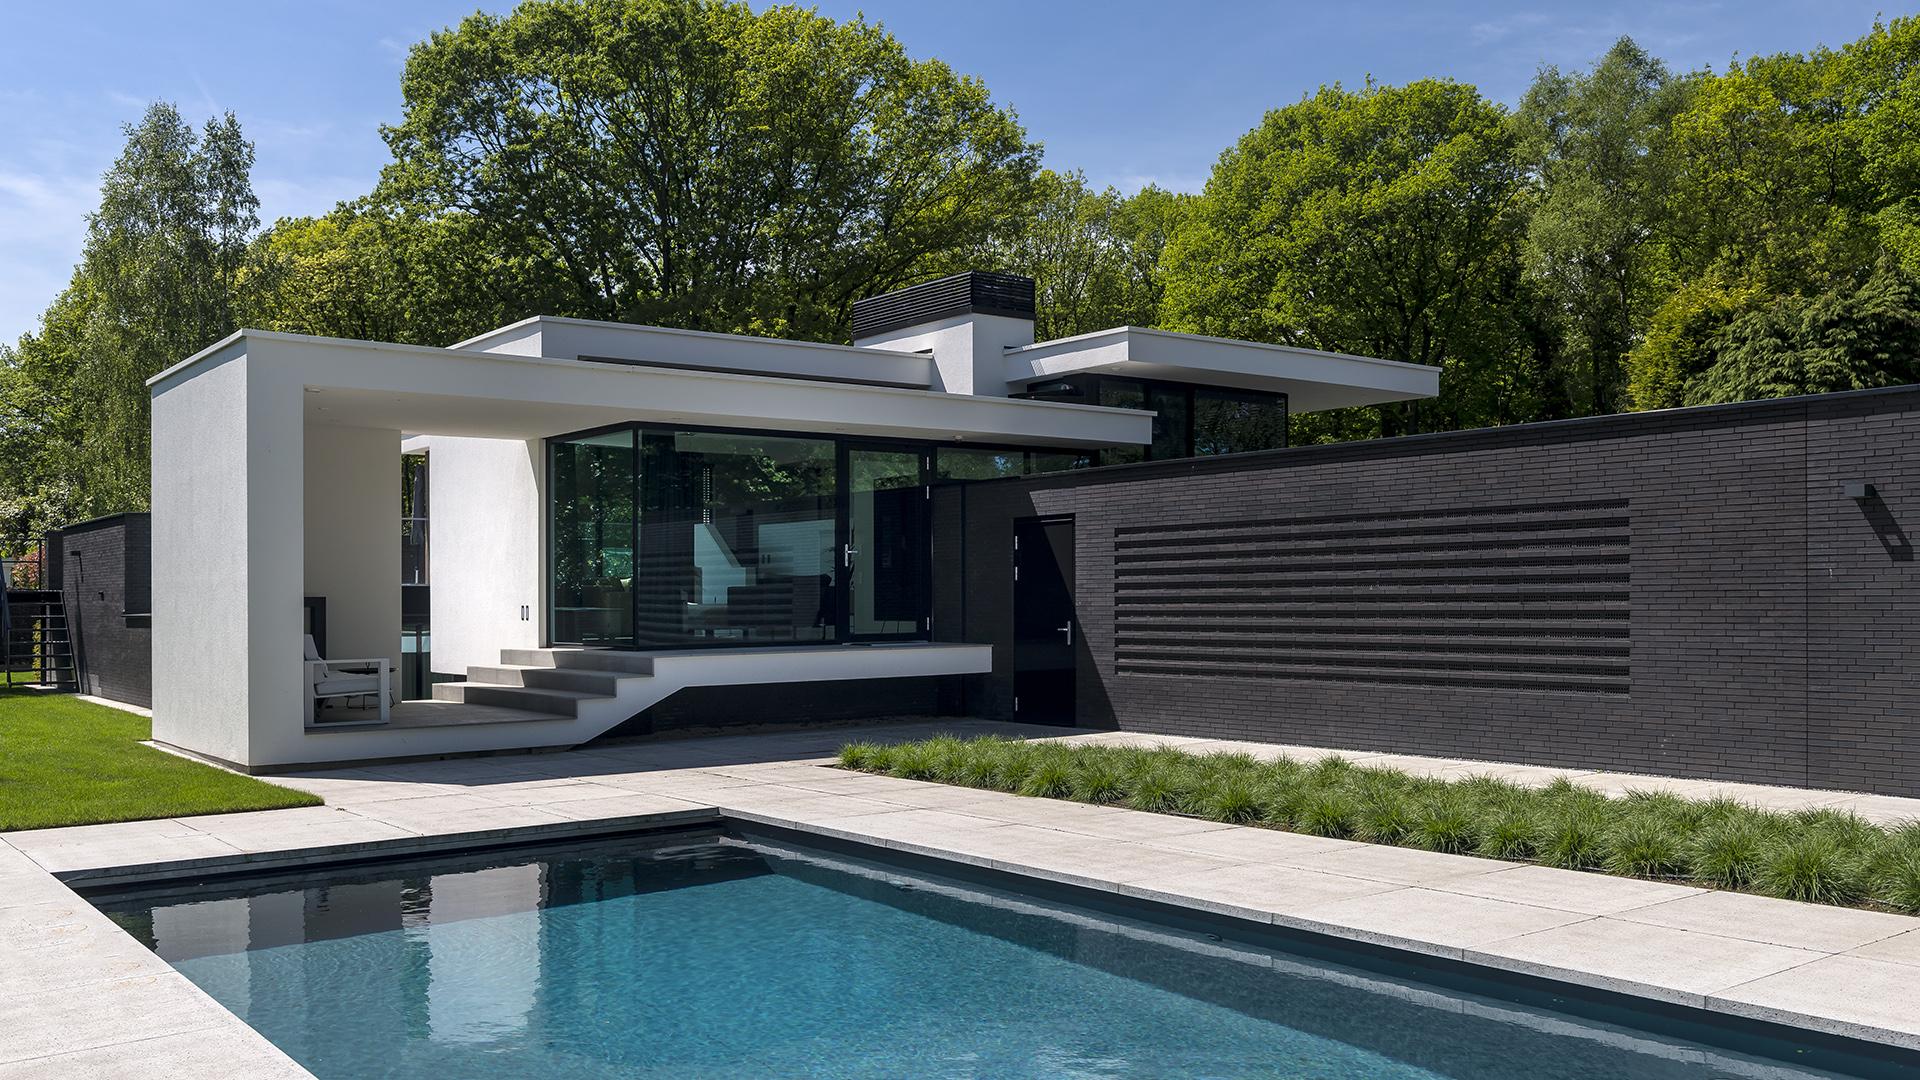 Maas architect lochem en zeist ontwerpen die verrassen for Dat architecten